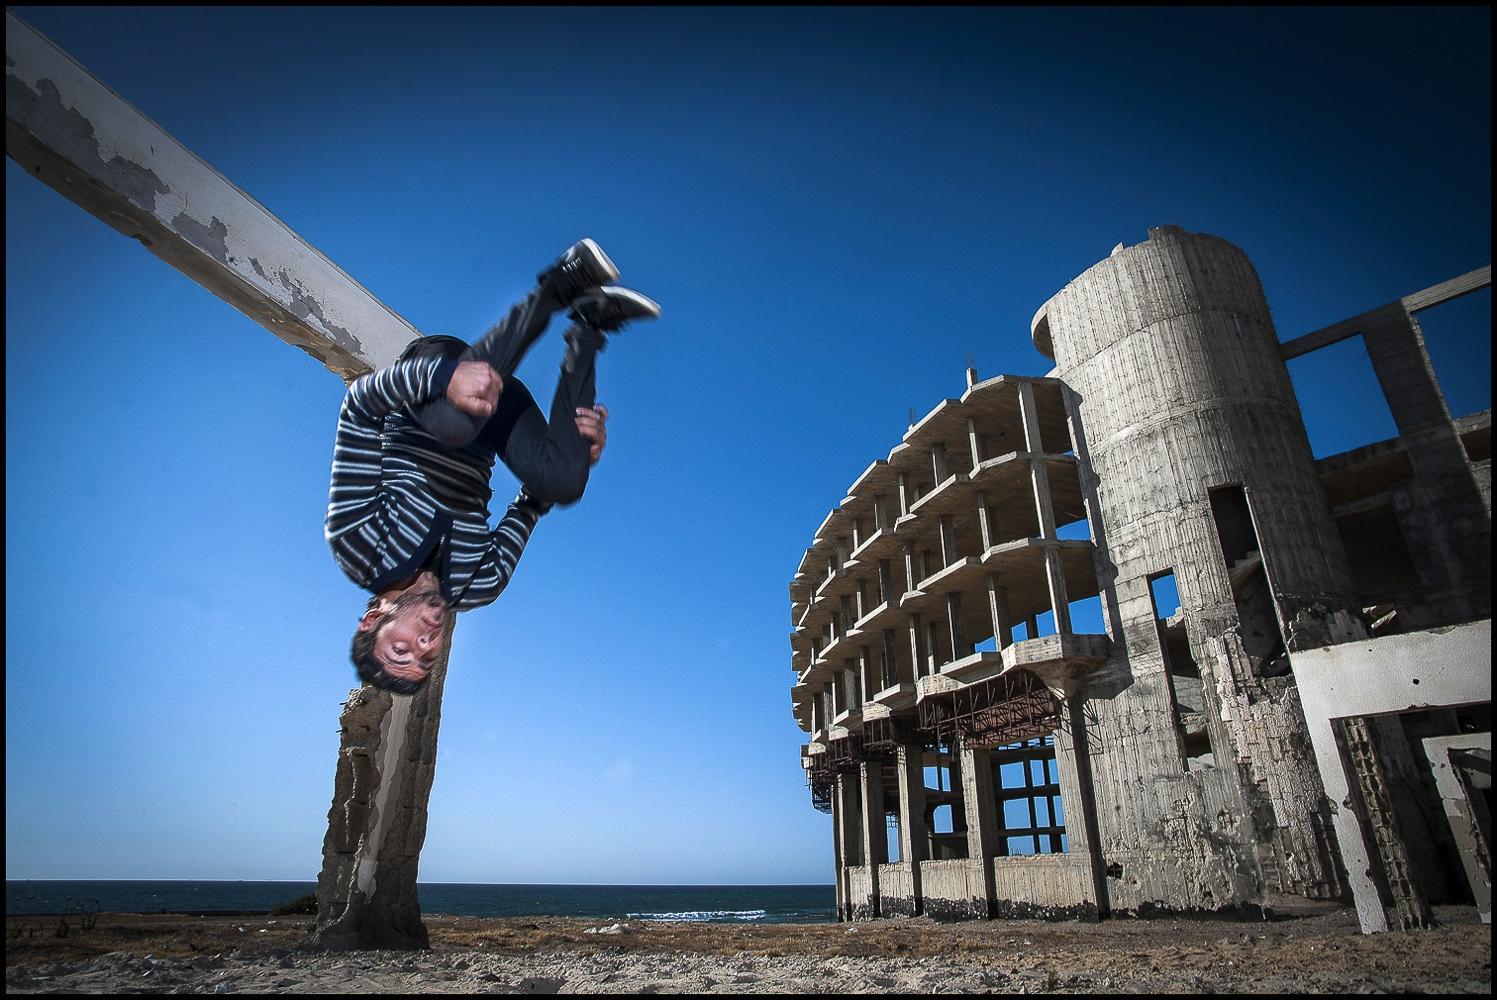 Hanson goes airborne at Alwaha, Northern Gaza, occupied Palestinian territory.